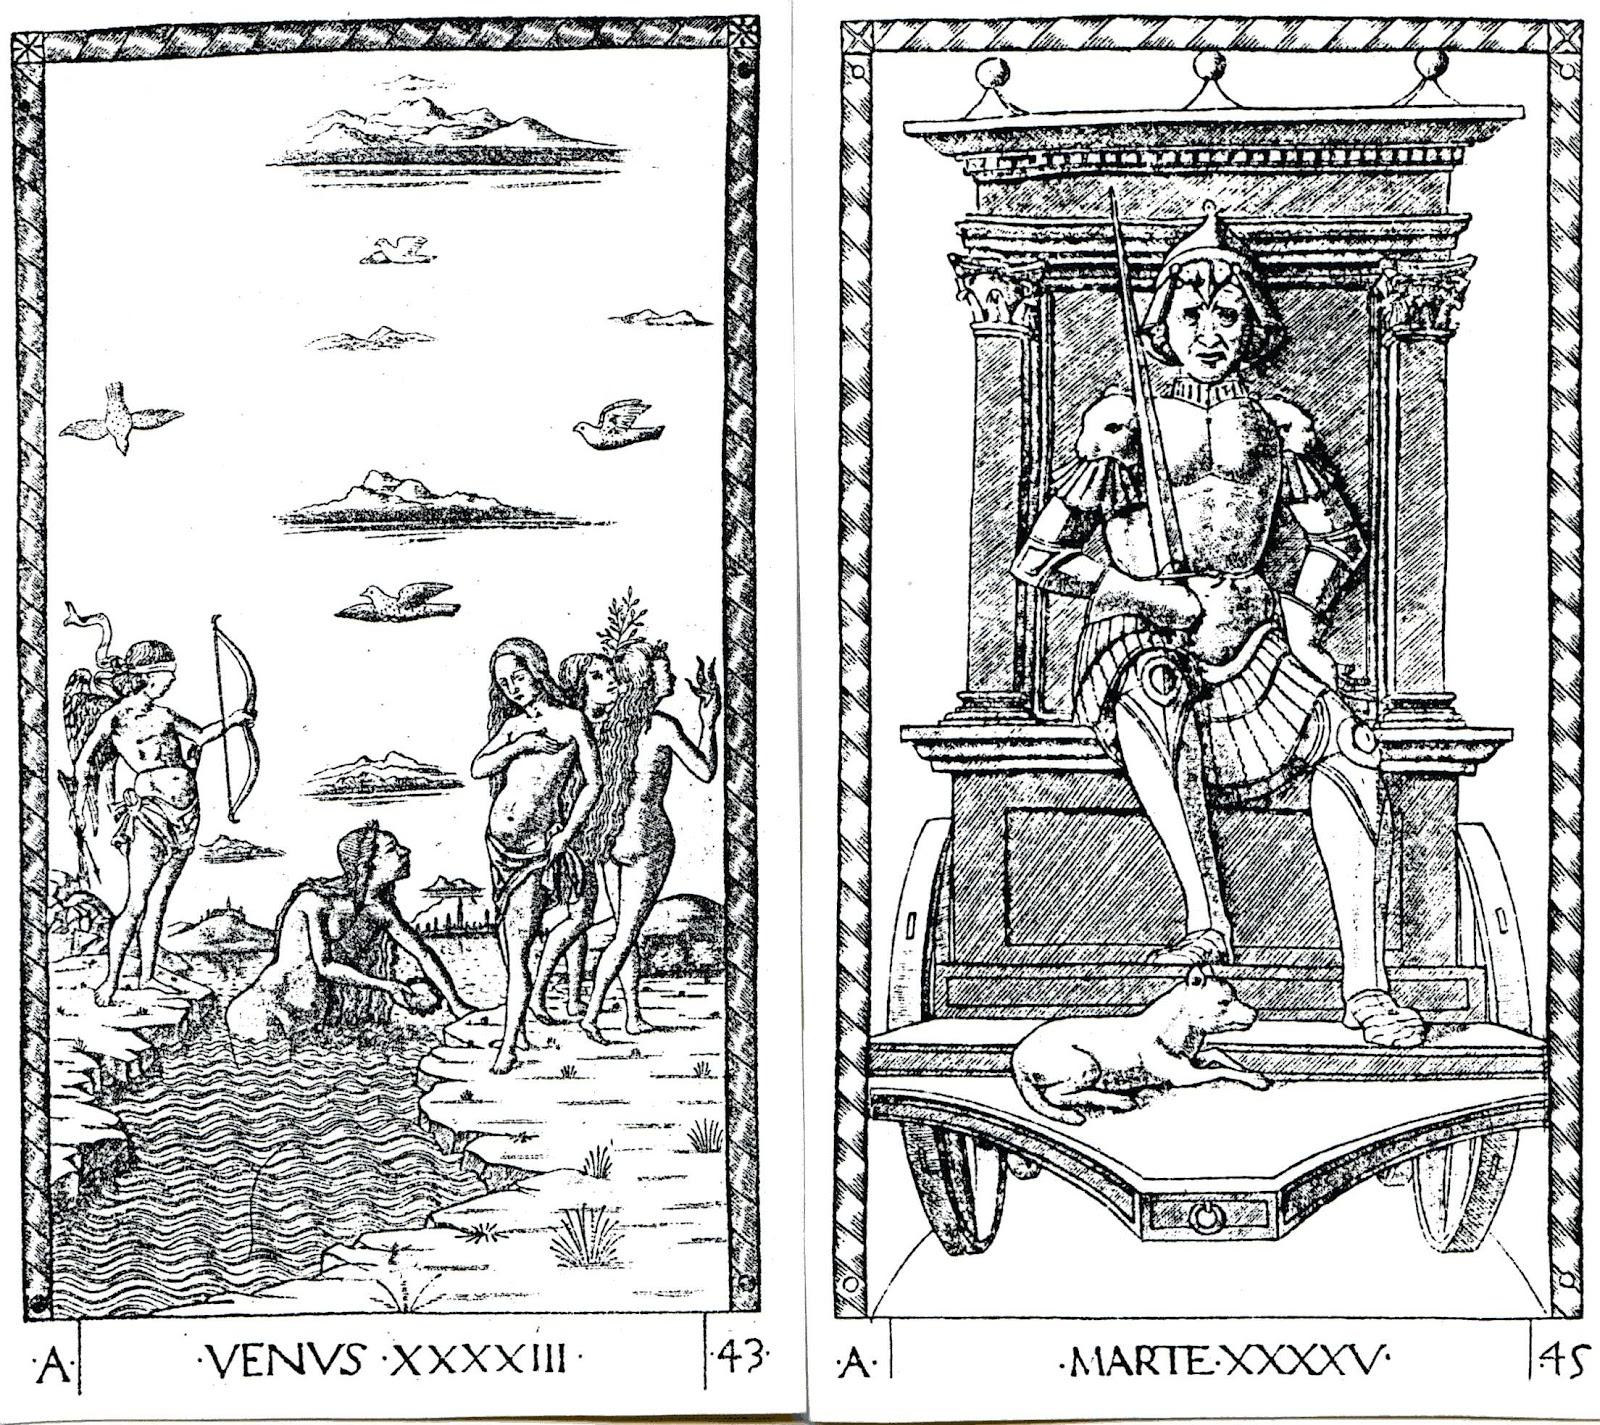 venus mars matchmaking Kundli matchmaking  foresee your conjugal life through the the 7th house in your kundali  venus aries mars 8 scorpio mars taurus venus 9 sagittarius.